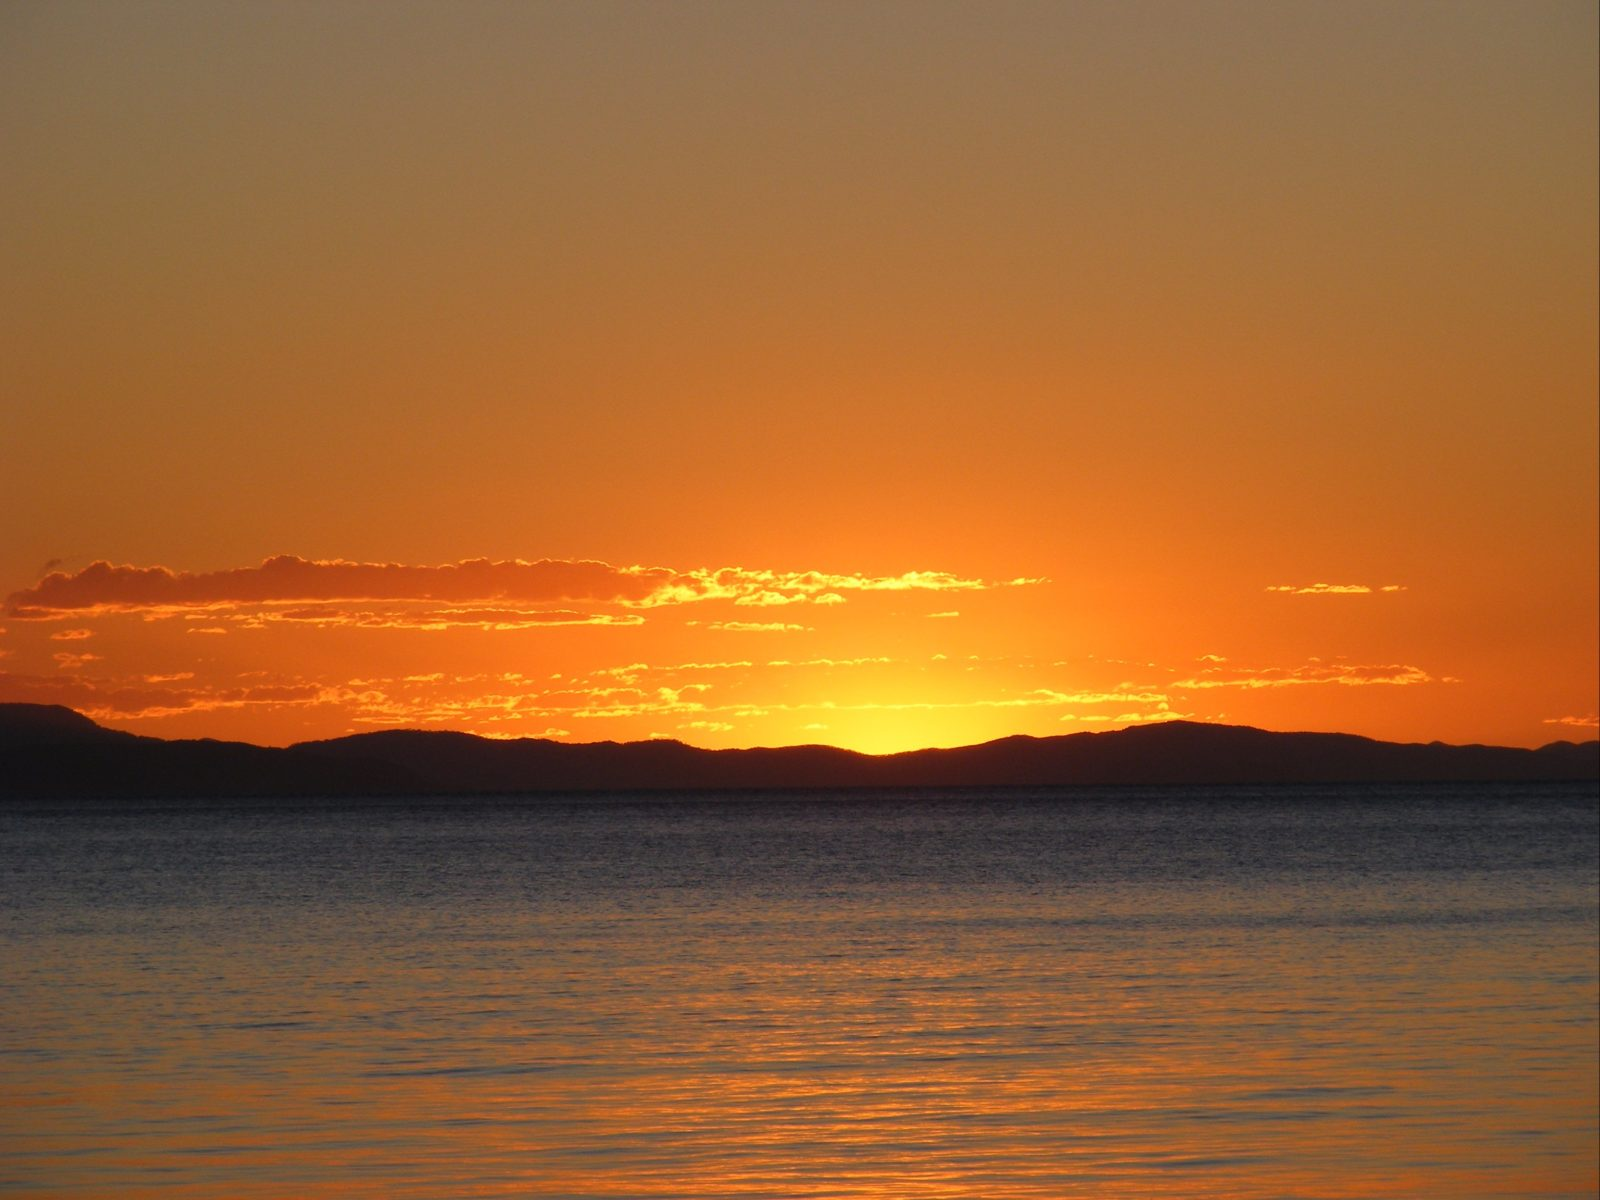 Sunset, Hook Island